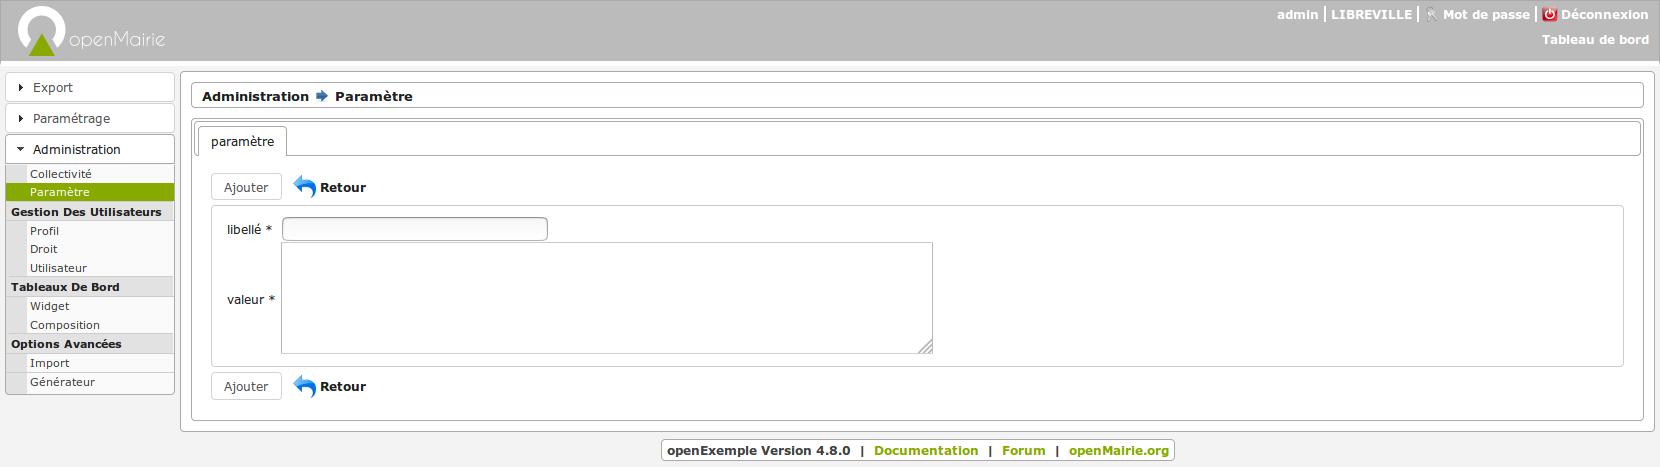 Publication de la version 'Framework openMairie 4.8.0'